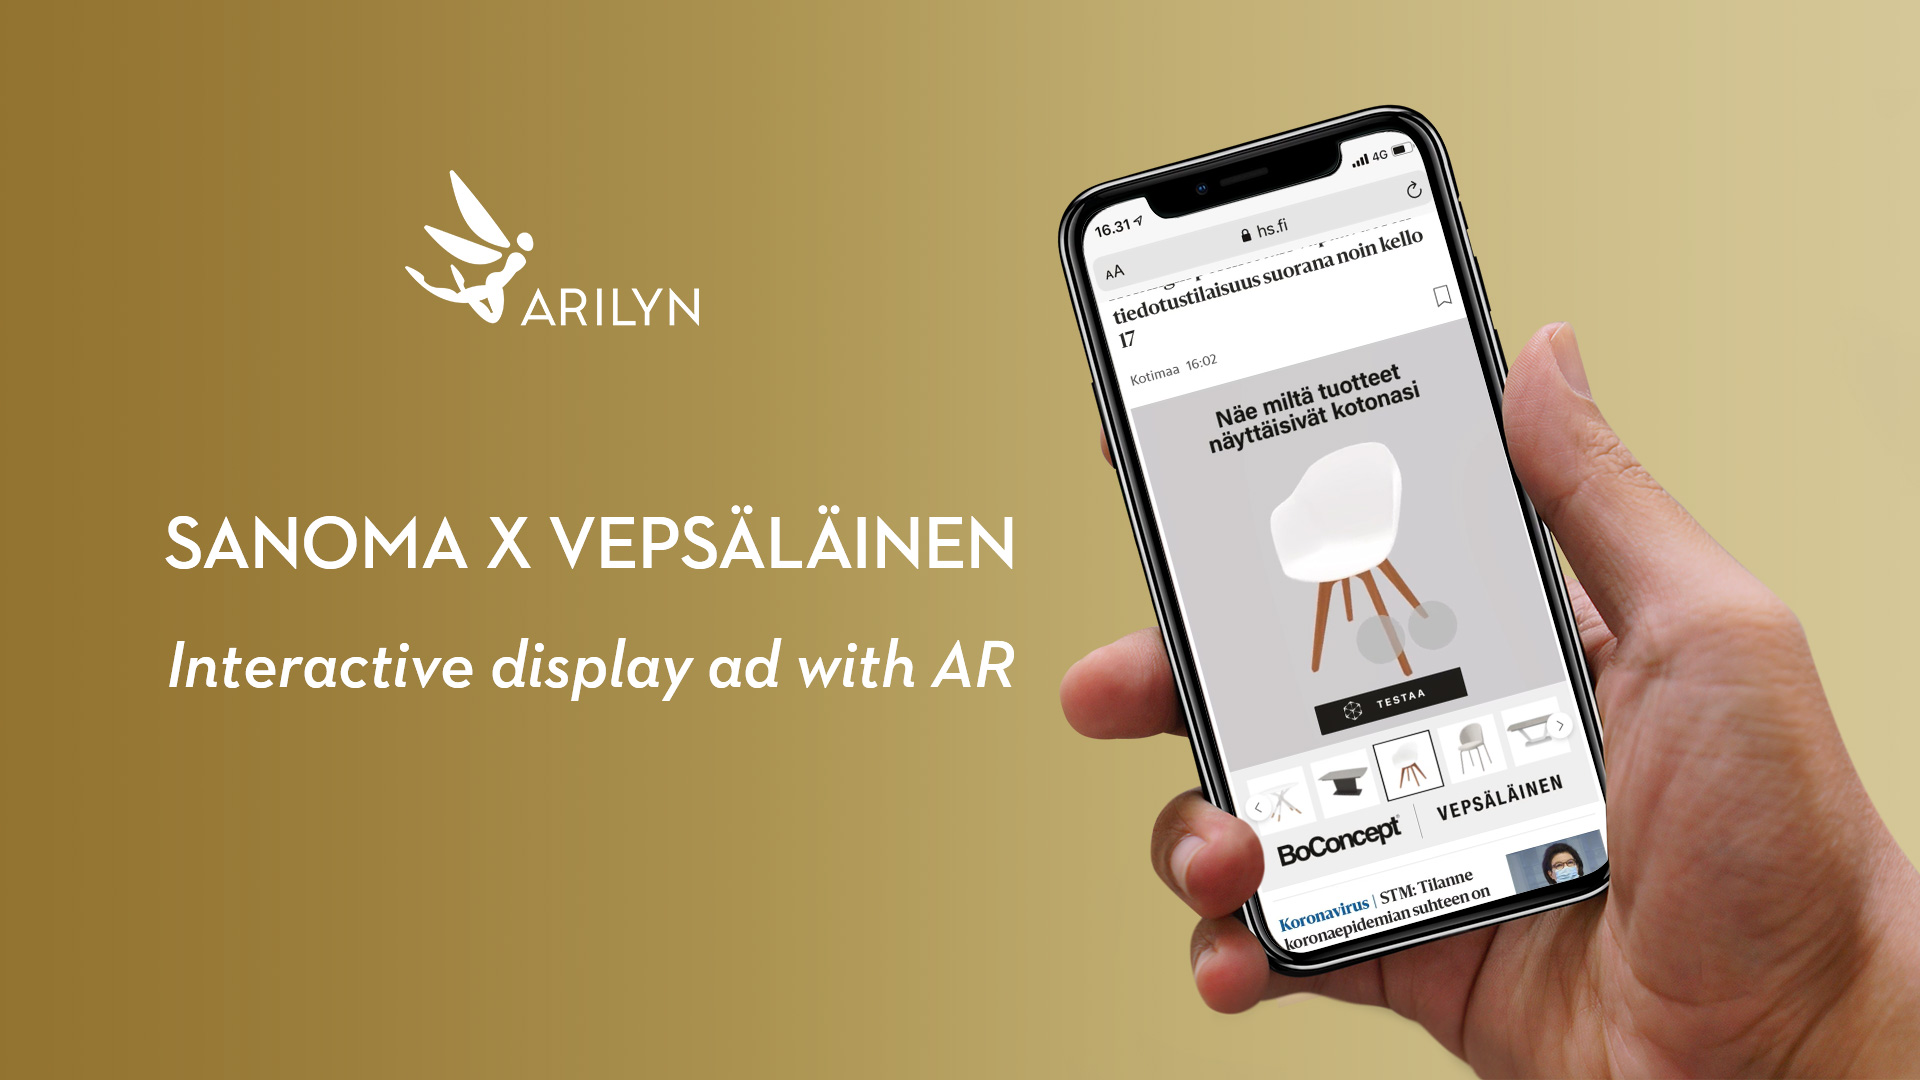 A new form of display ads arises - Sanoma x Vepsäläinen AR ad